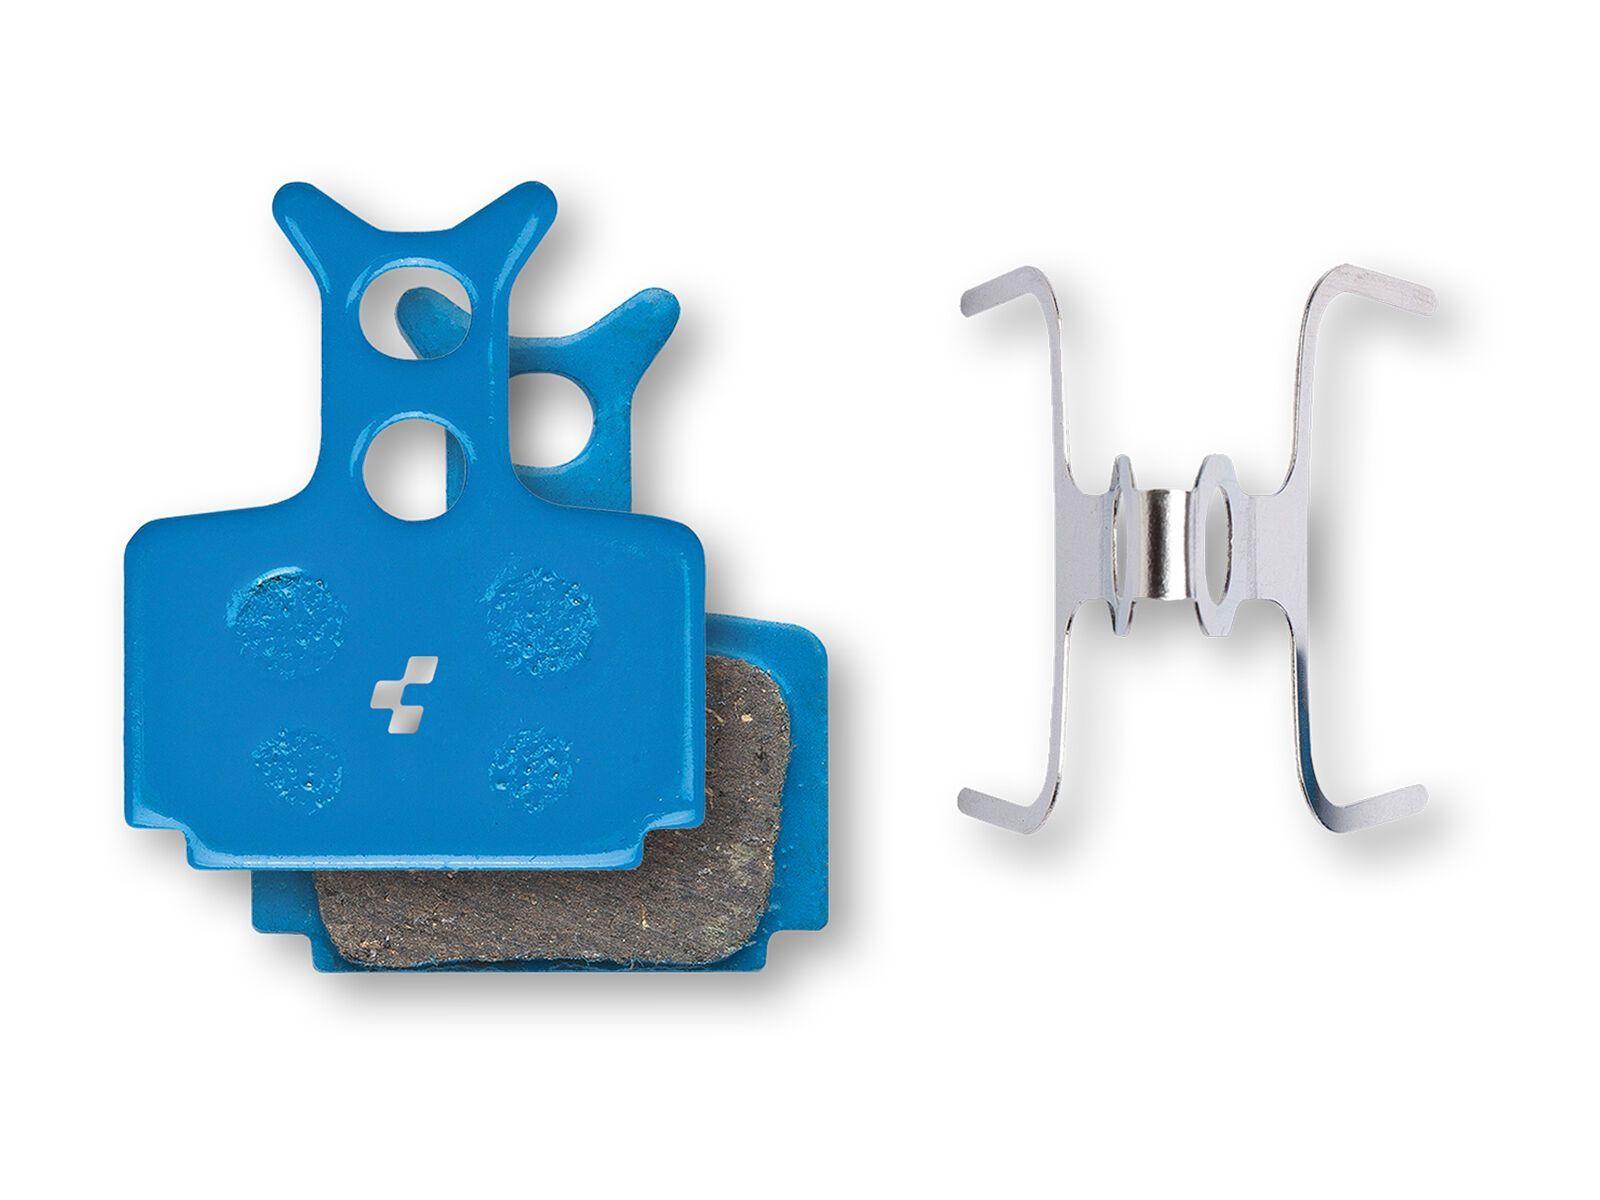 Cube Scheibenbremsbelag Formula Mega/R1/RX/The One RO/RC Tune - organisch blue 100050000